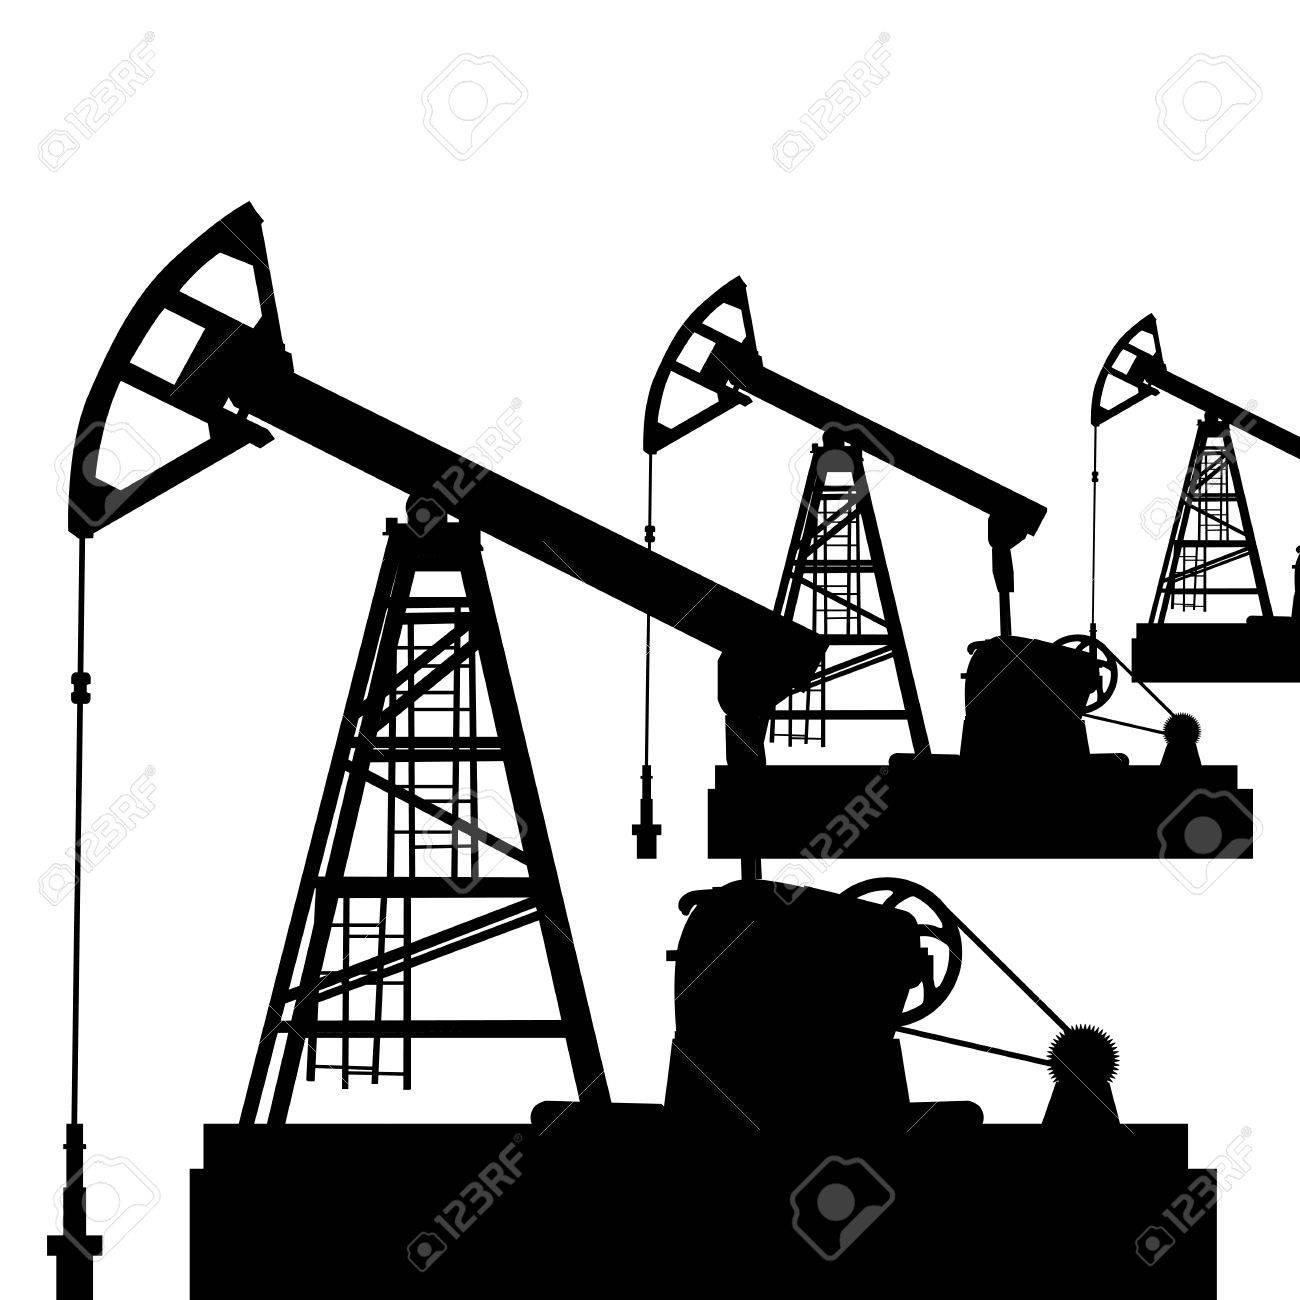 1300x1300 Oil Pump Jack. Oil Industry Equipment. Vector Illustration